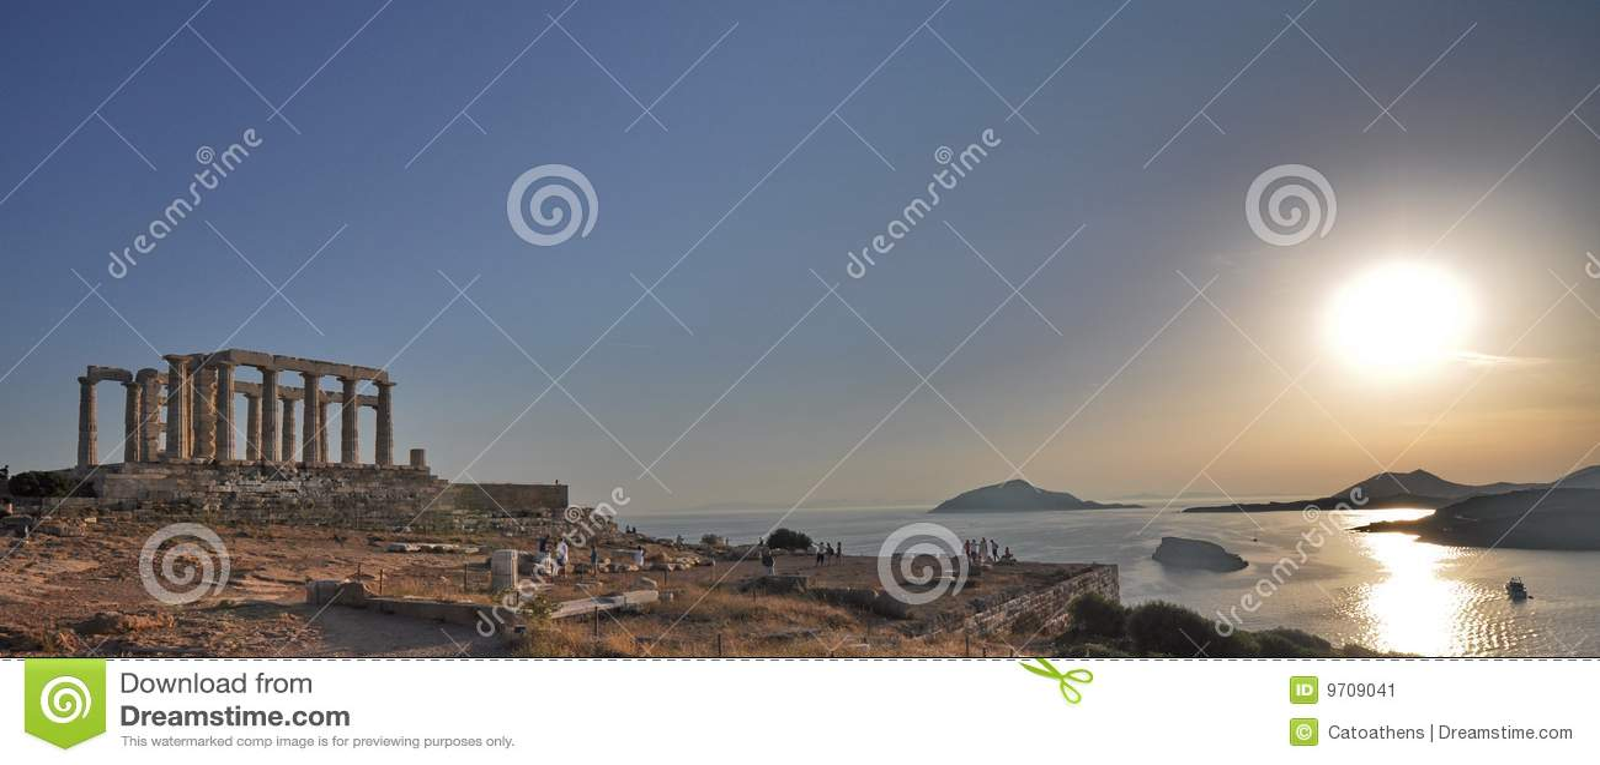 希腊sounion